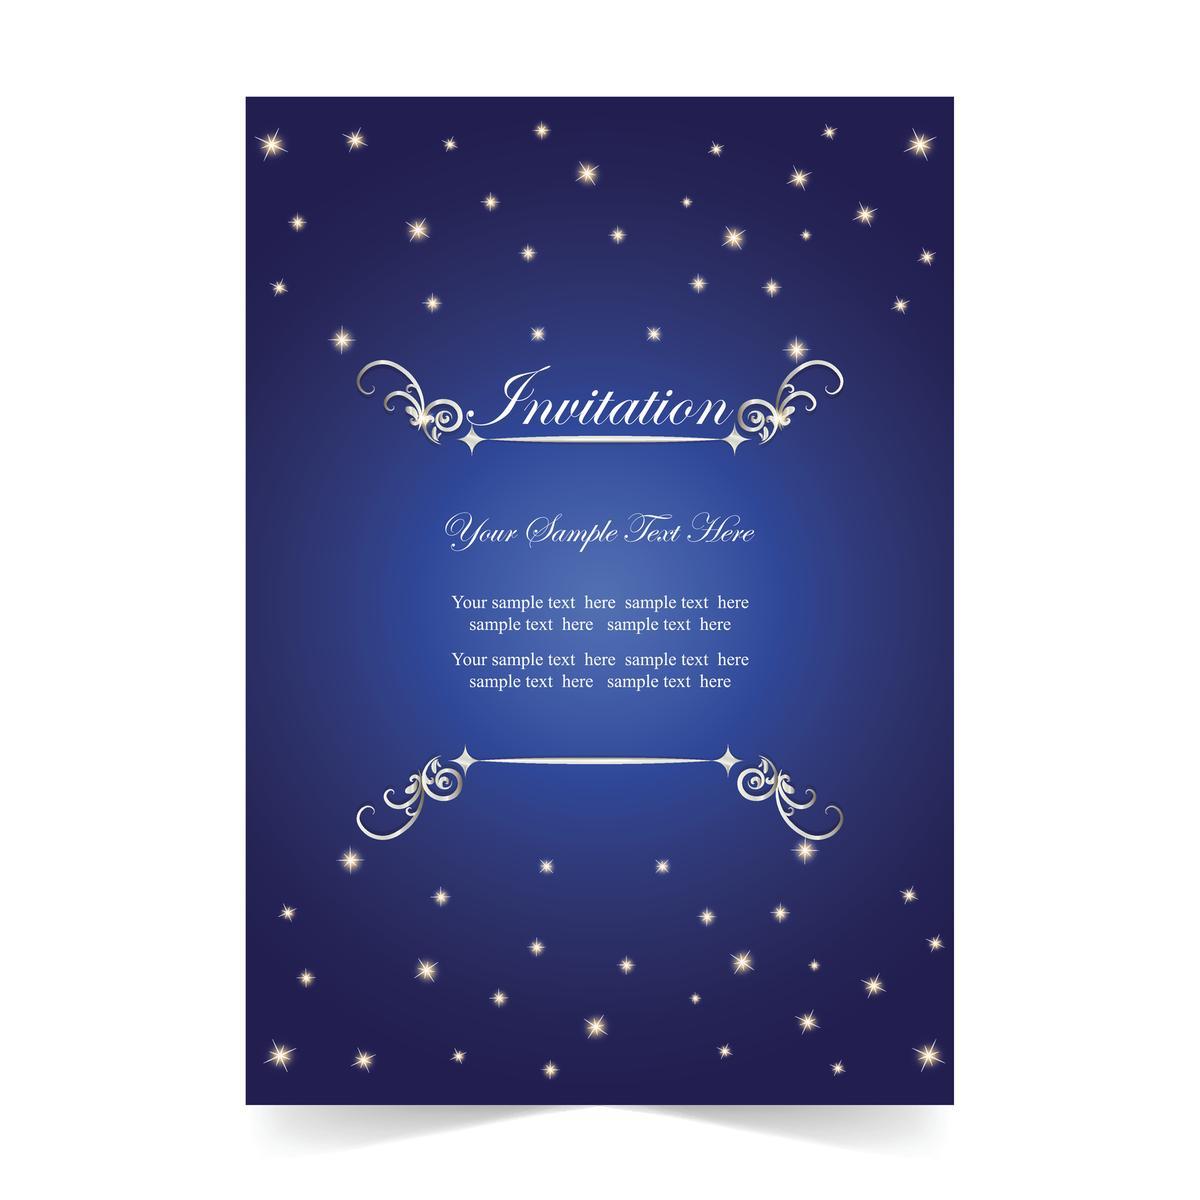 Outstanding wording samples for wedding reception invitations blue invitation card stopboris Choice Image